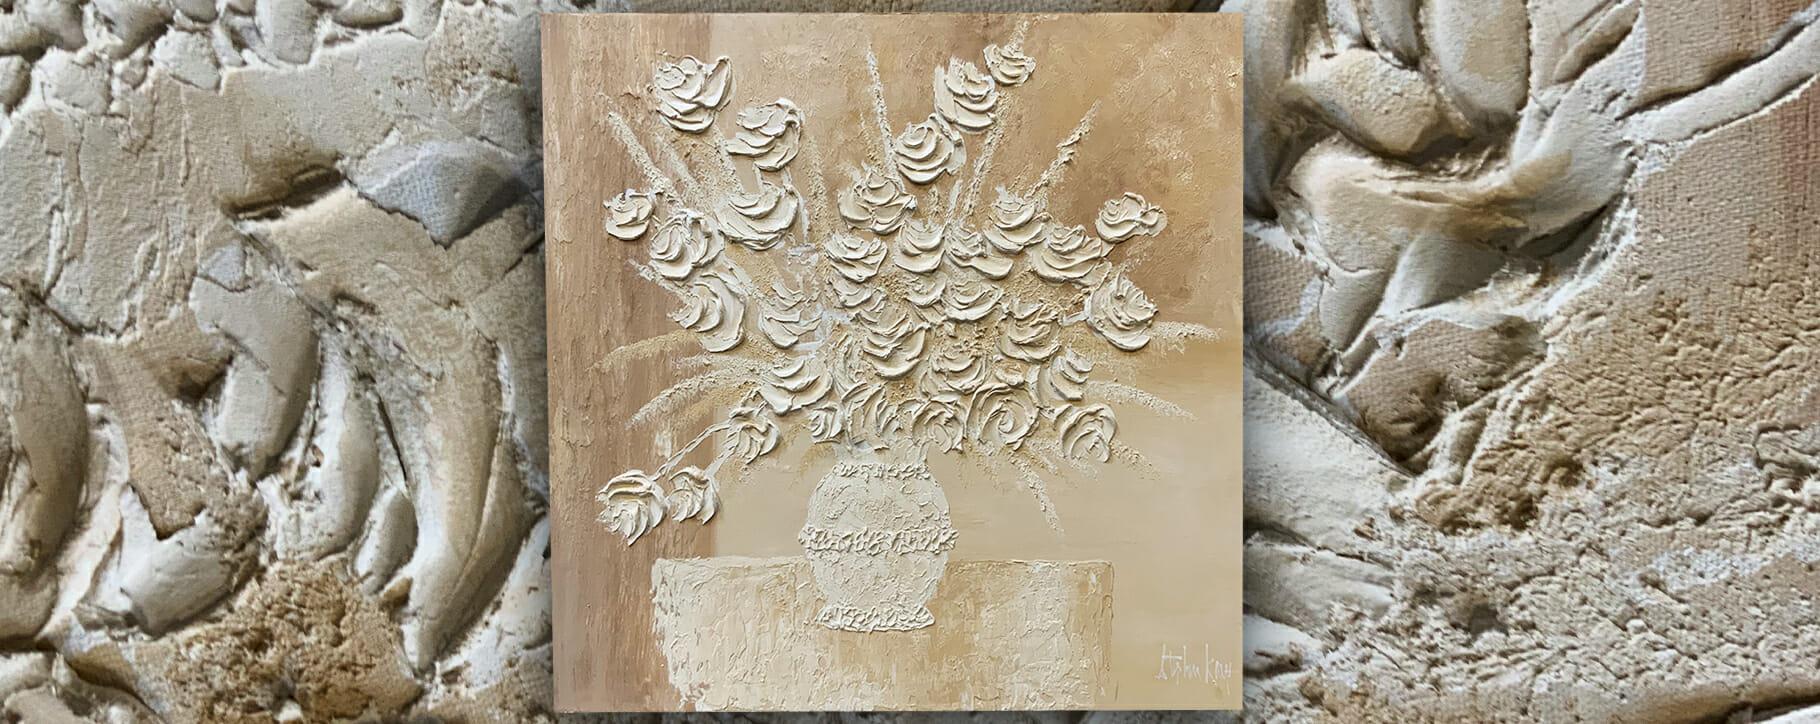 Impasto White Flowers Flaking